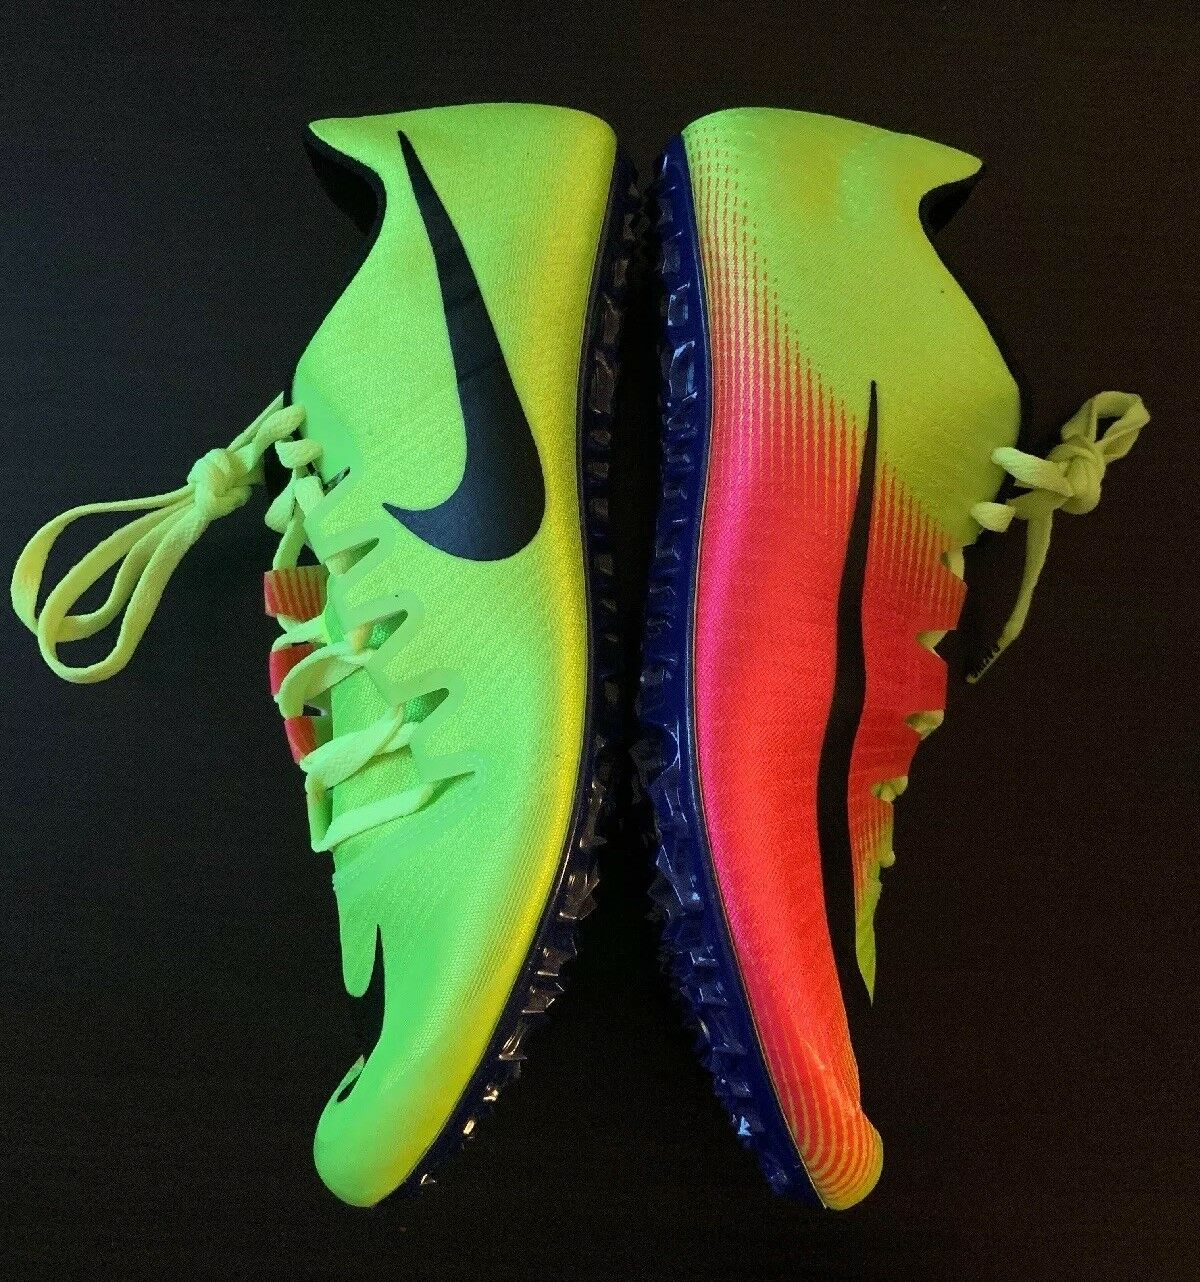 Nike Zoom JA Fly 3 Sprint Track Spikes 882032-999 Volt Pink Olympics Rio SZ 10.5